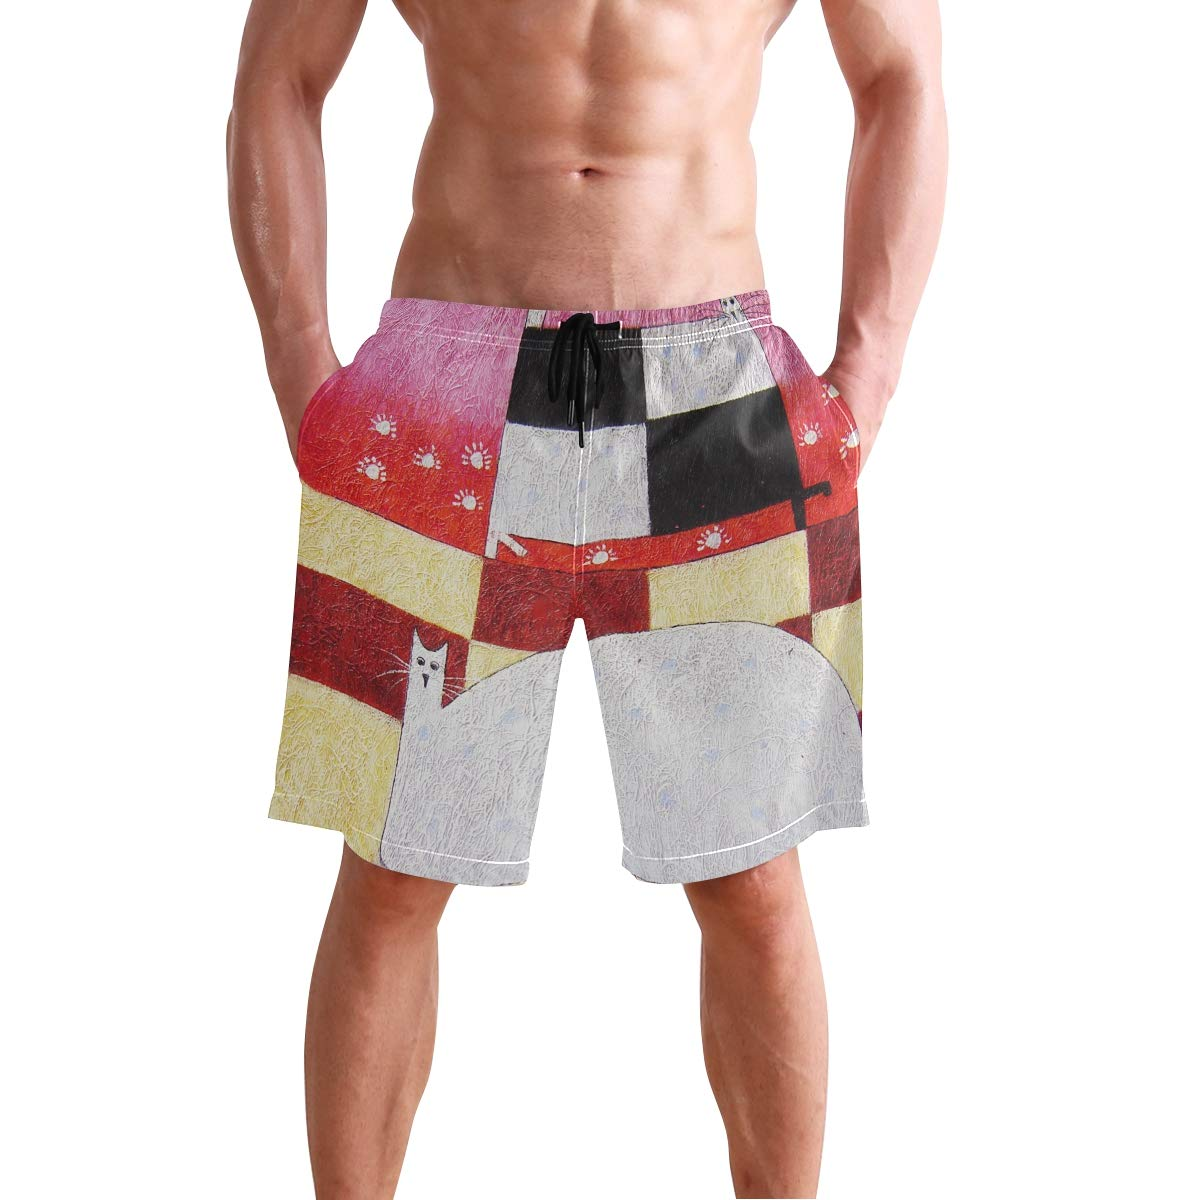 DEYYA Mens Cat Art Painting Summer Beach Shorts Pants Swim Trunks Board Short for Men